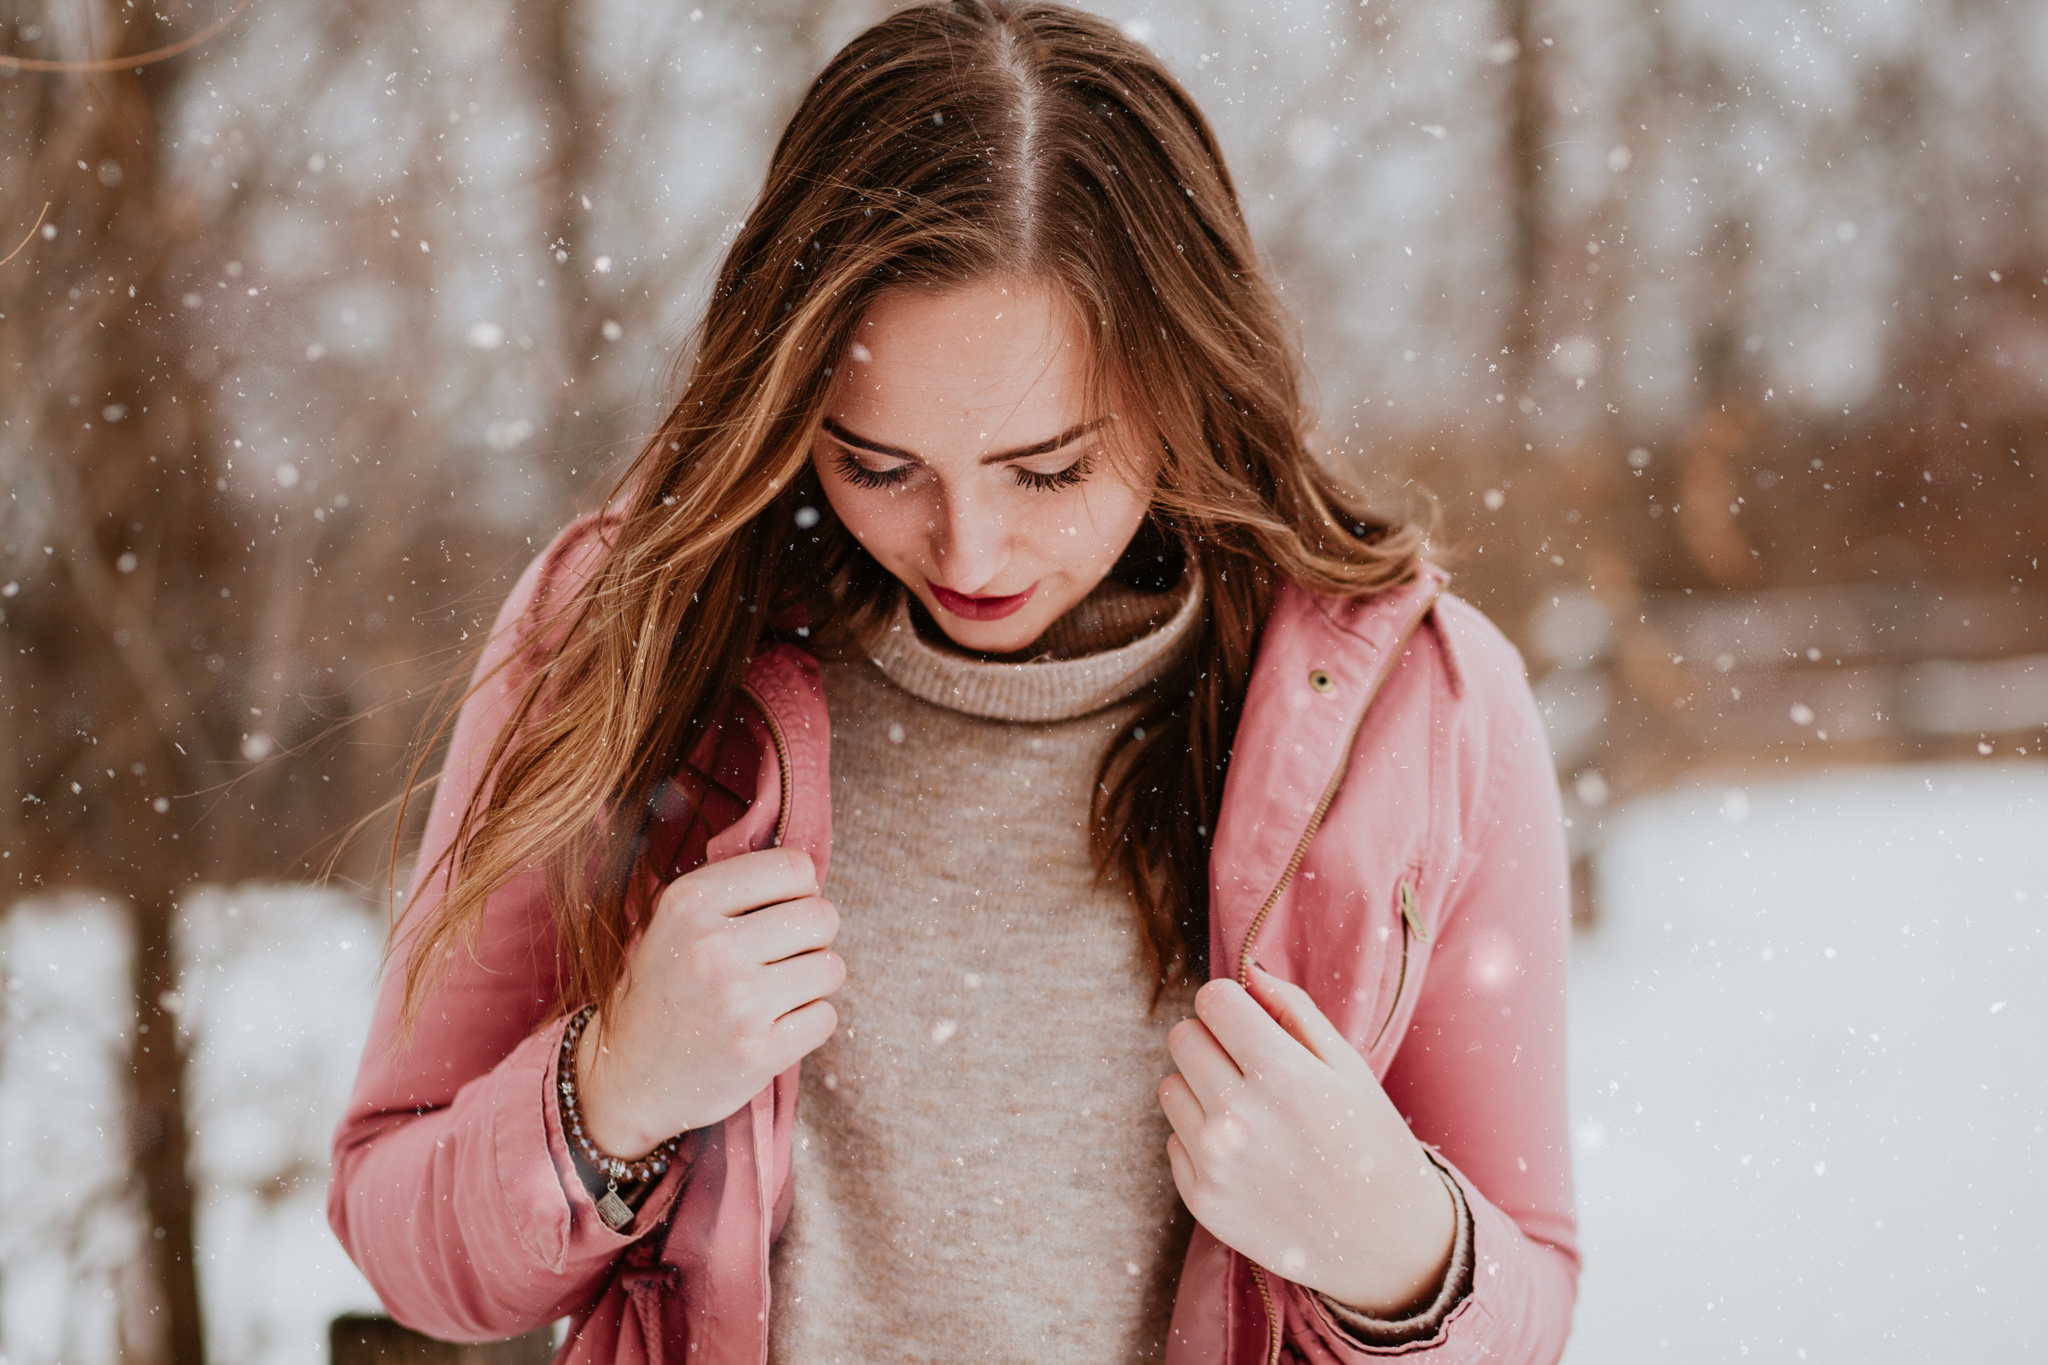 rochelle-6 copy-snow.jpg